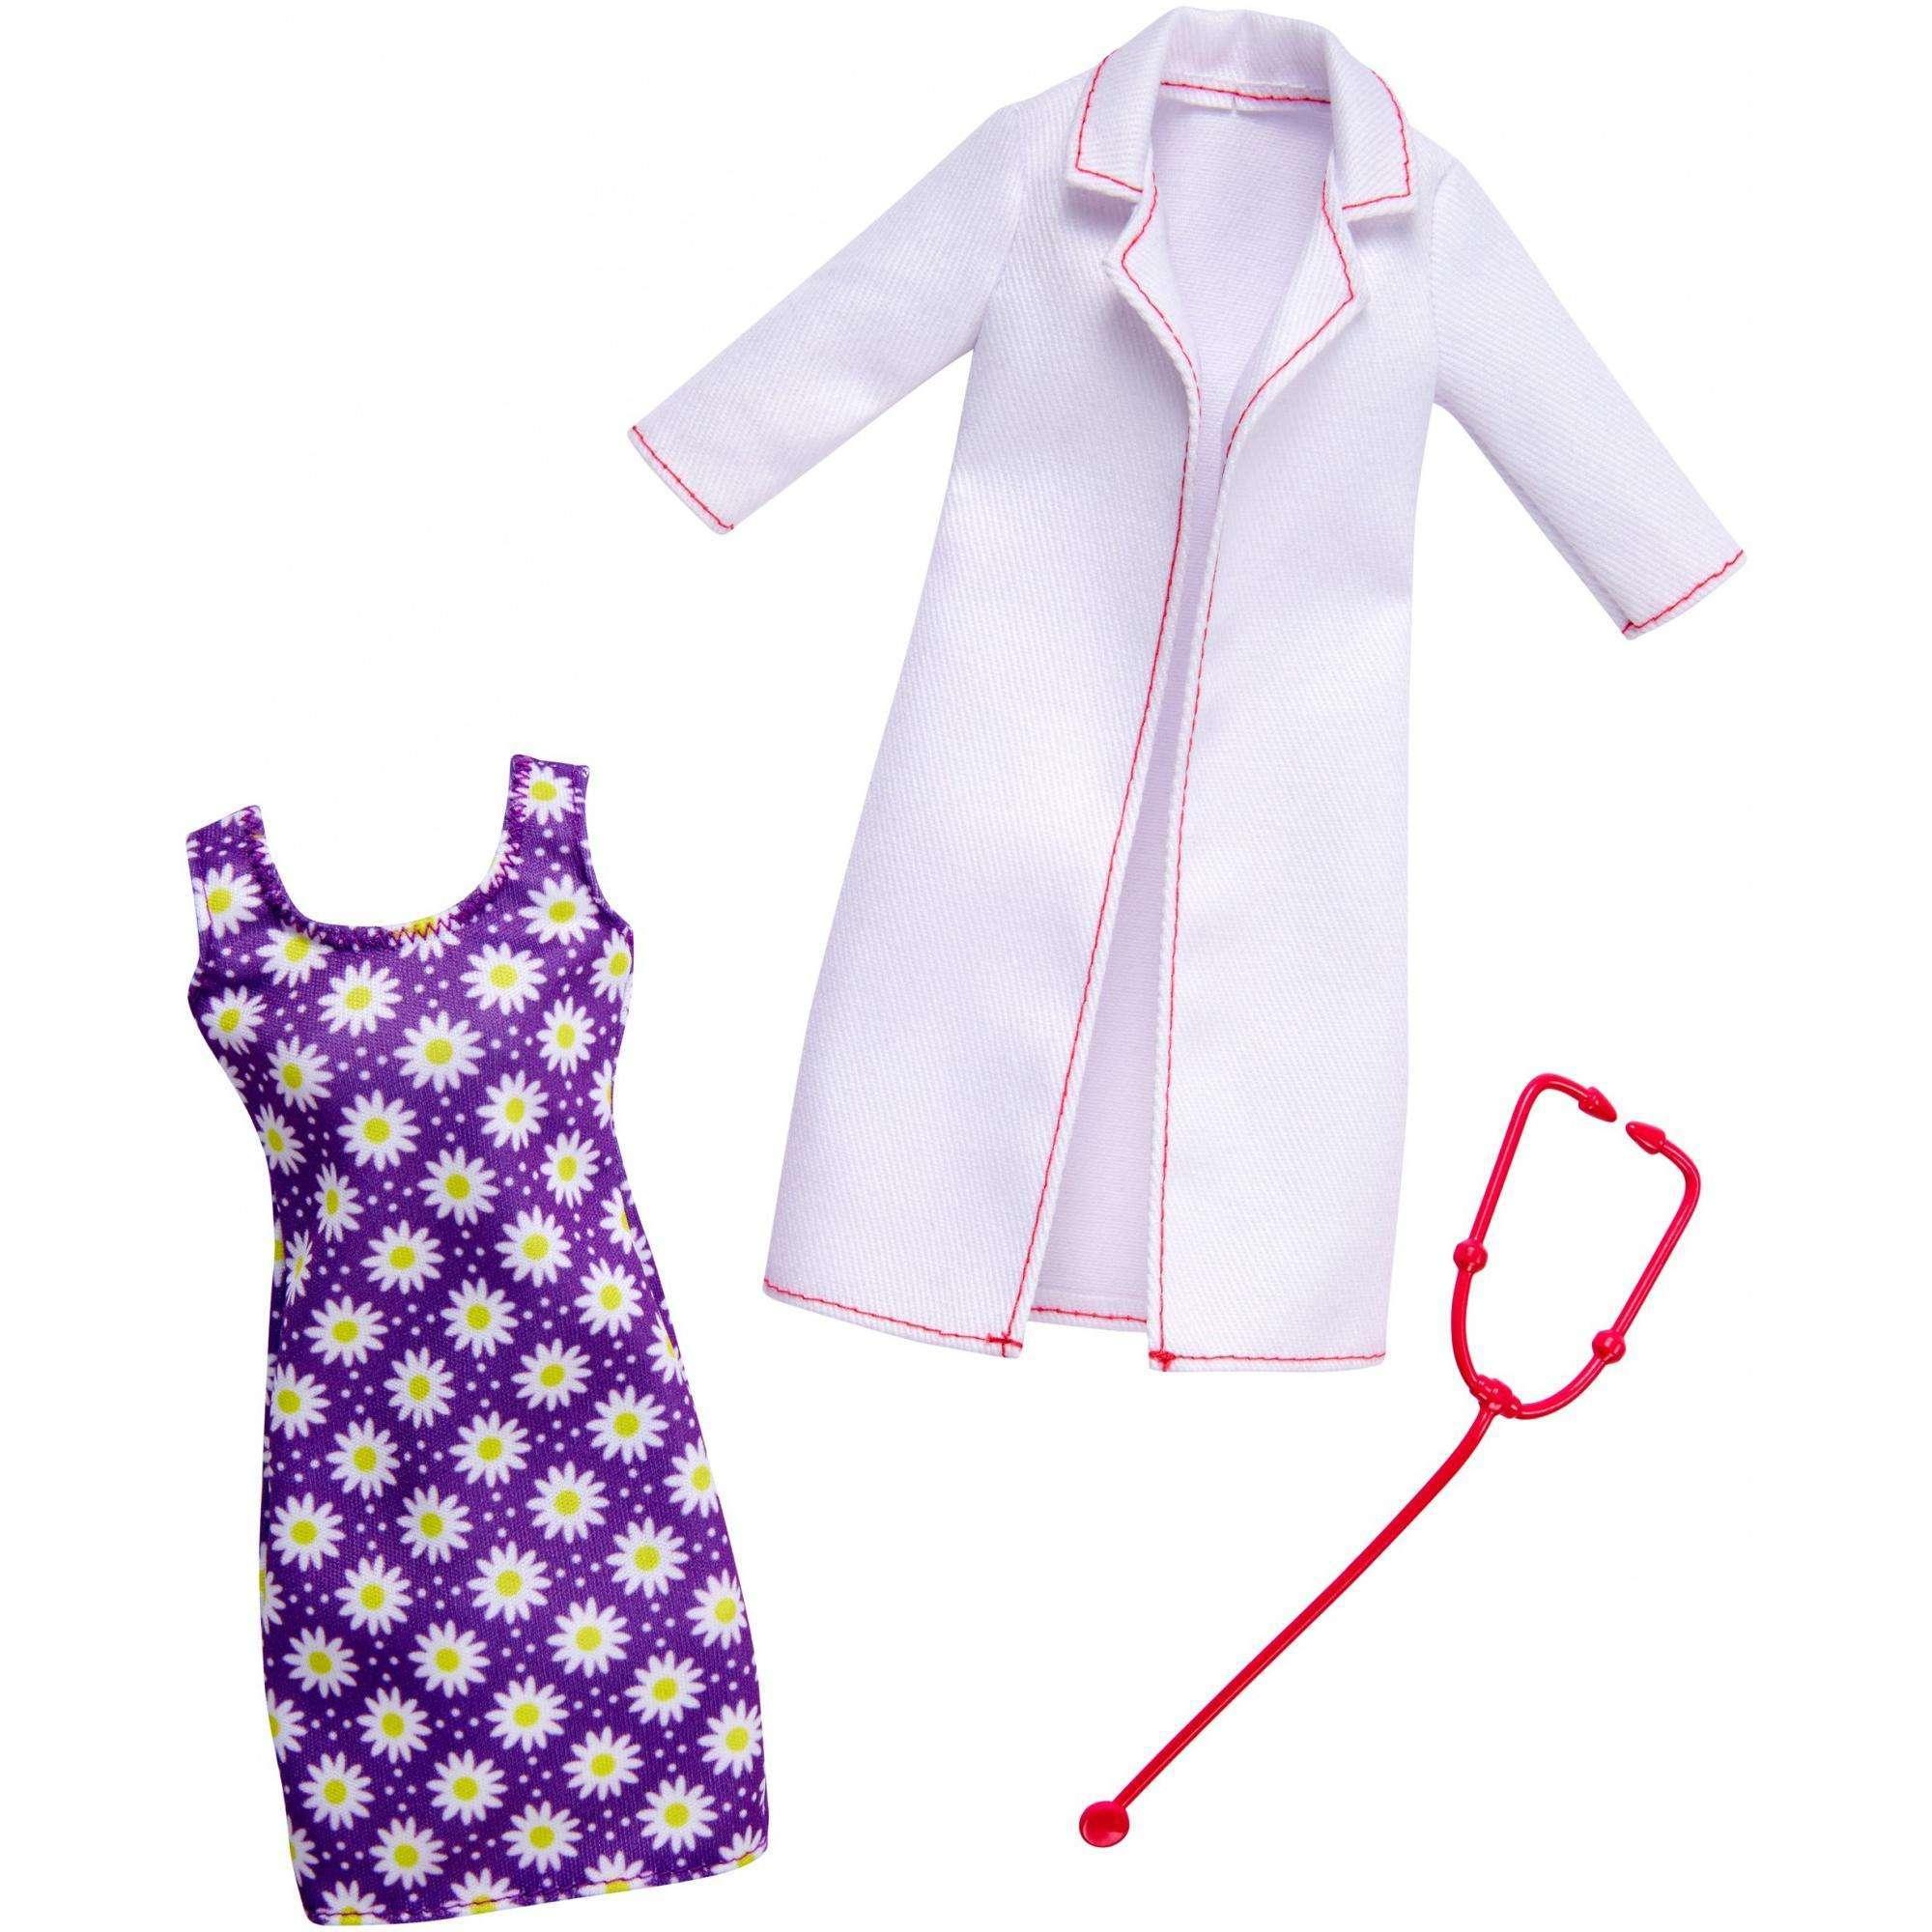 Barbie Career Fashions, Doctor